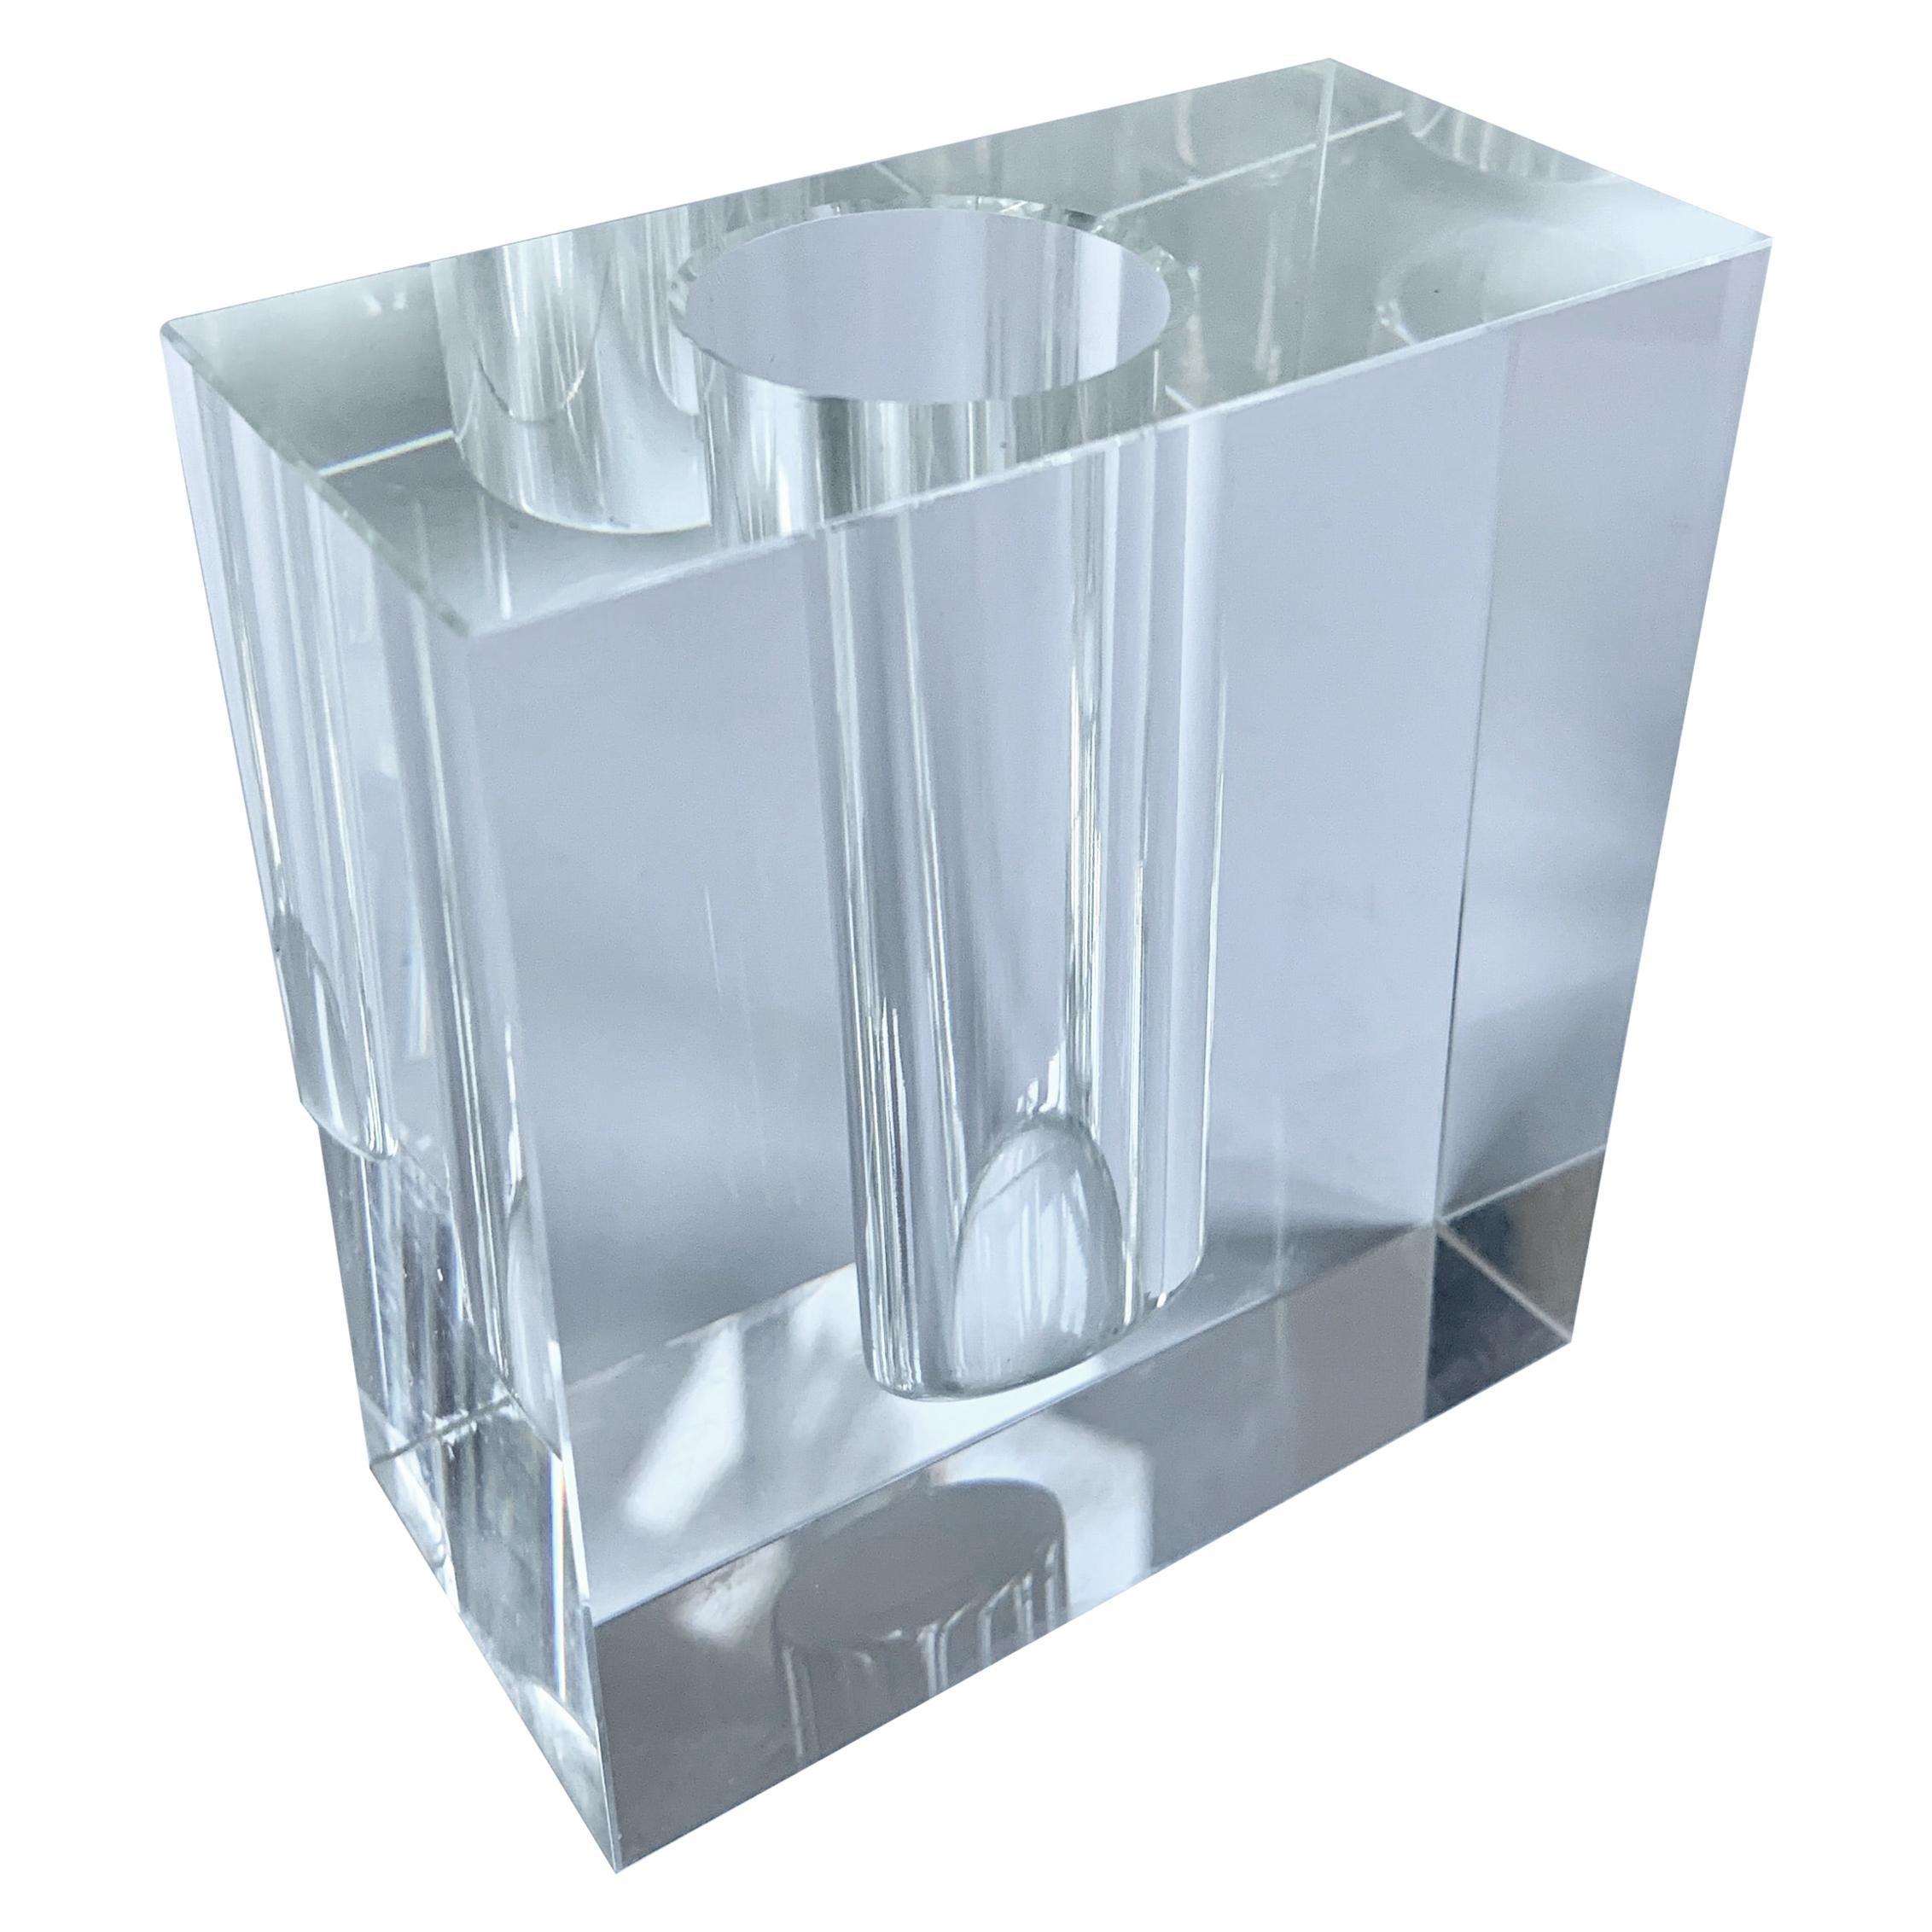 Crystal Block Form Vase